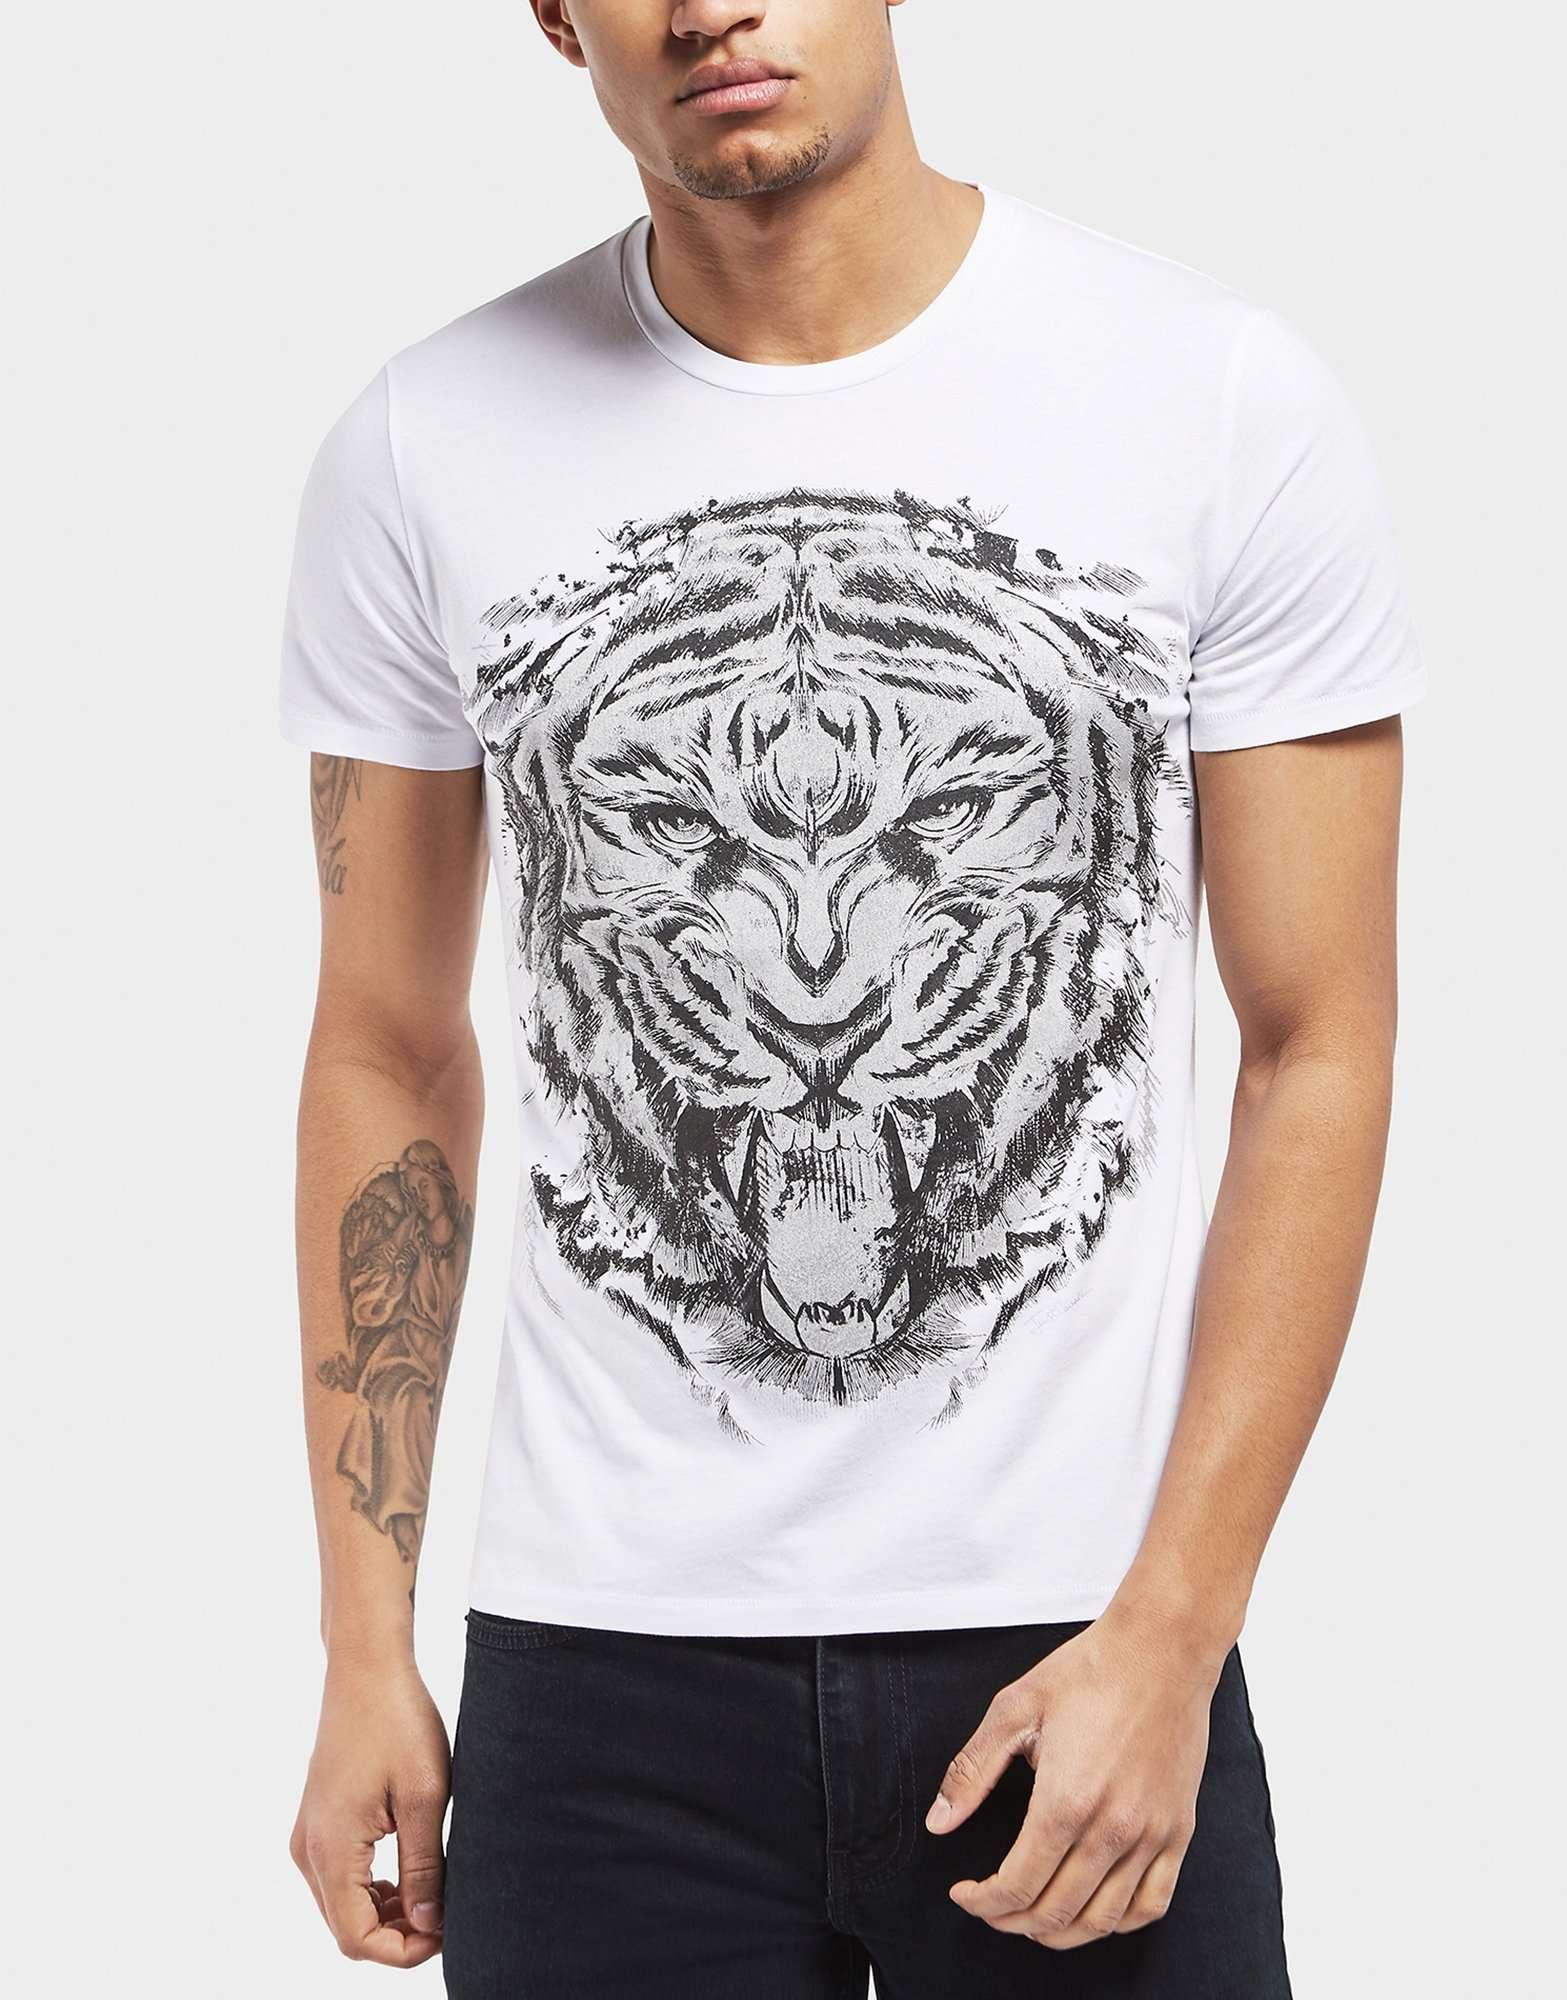 ad070c078 Just Cavalli Tiger T Shirt | Top Mode Depot